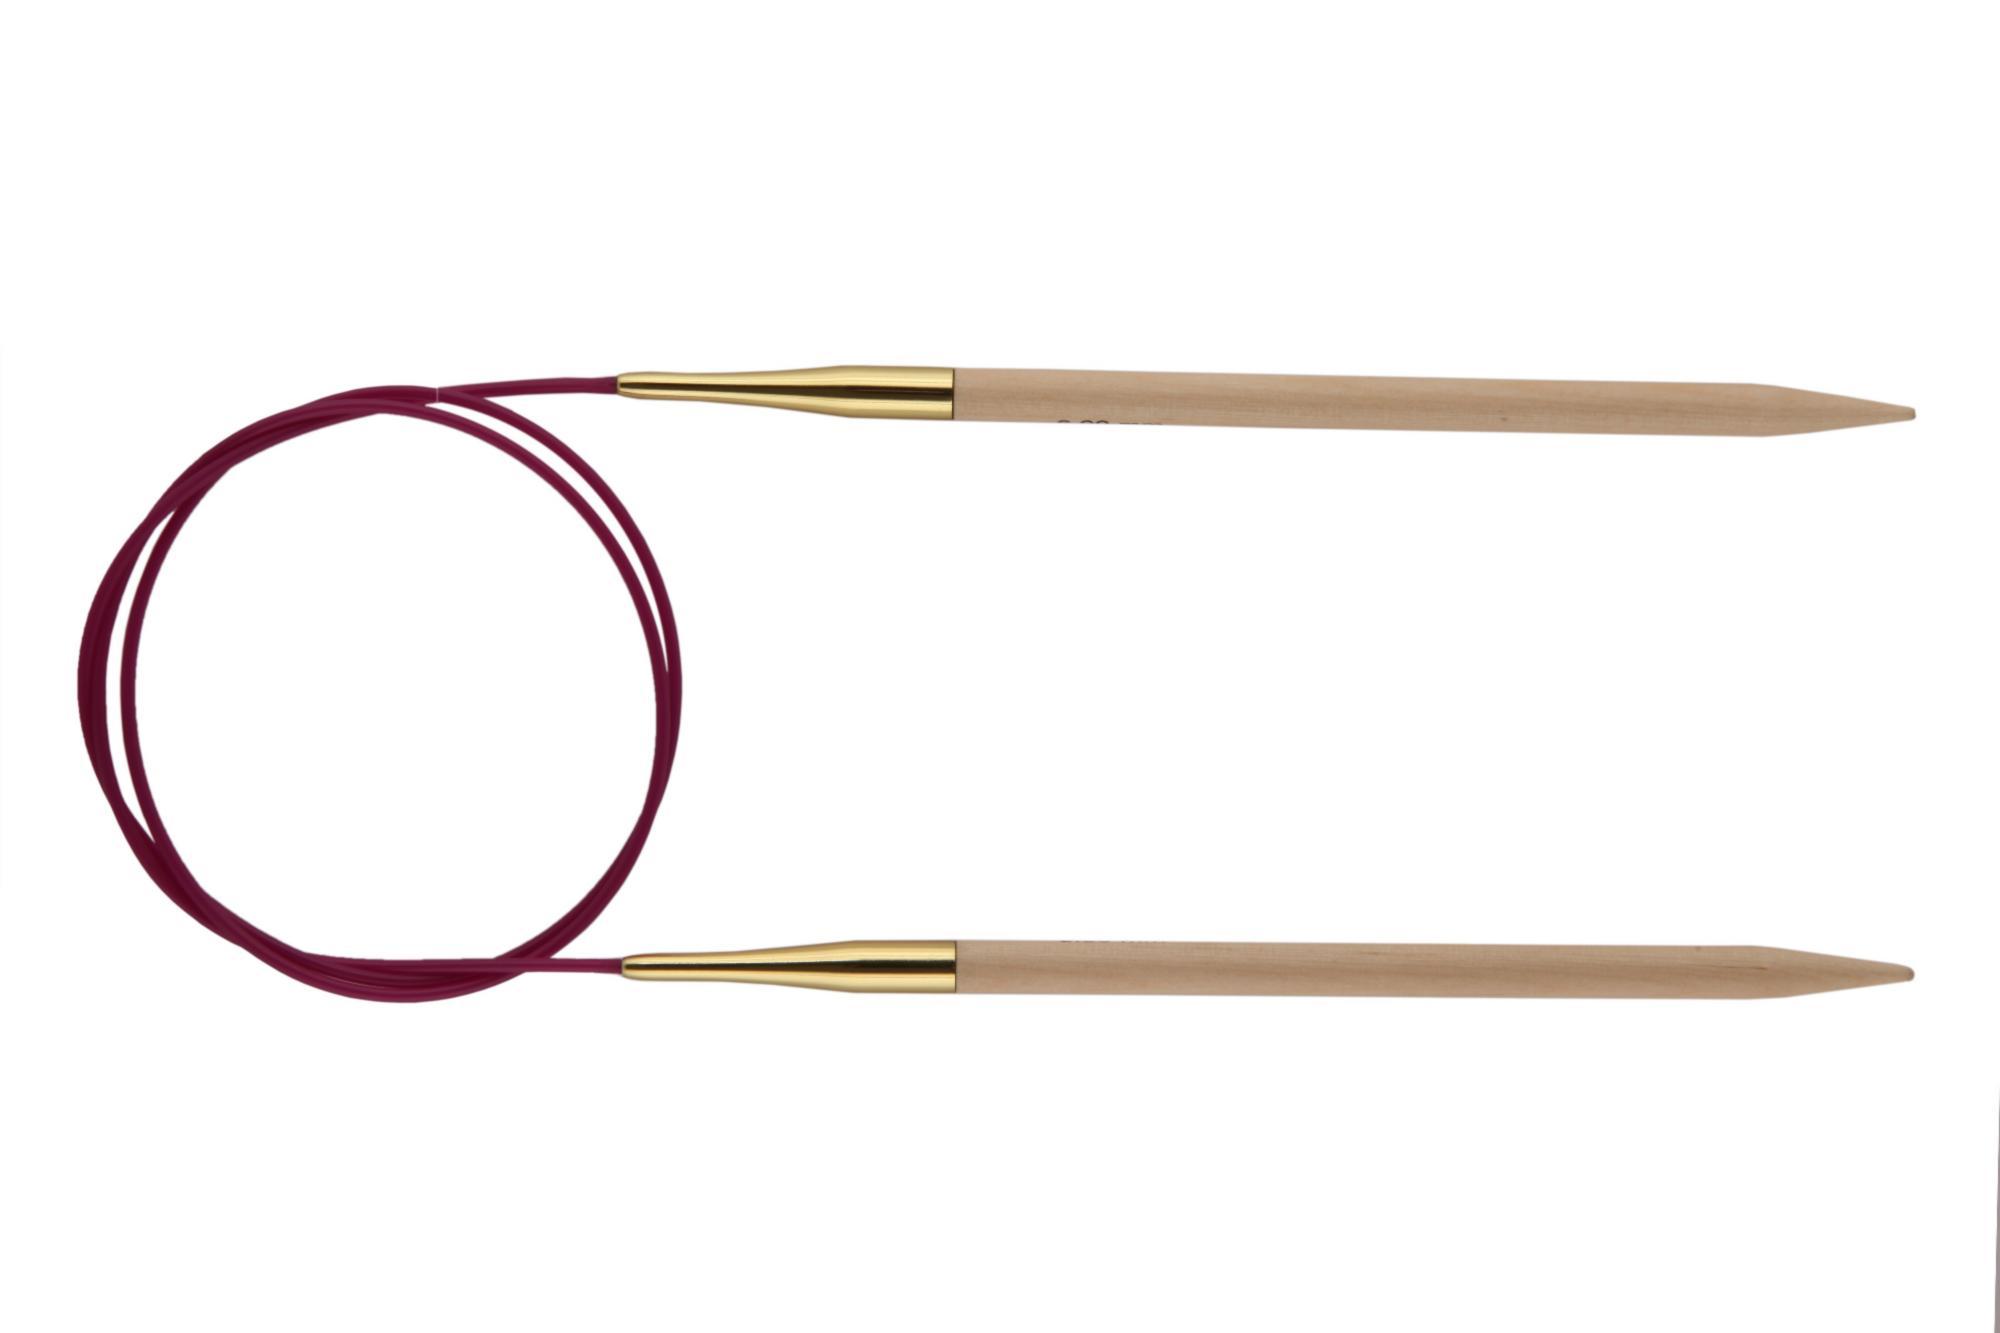 Спицы круговые 150 см Basix Birch Wood KnitPro, 35366, 9.00 мм